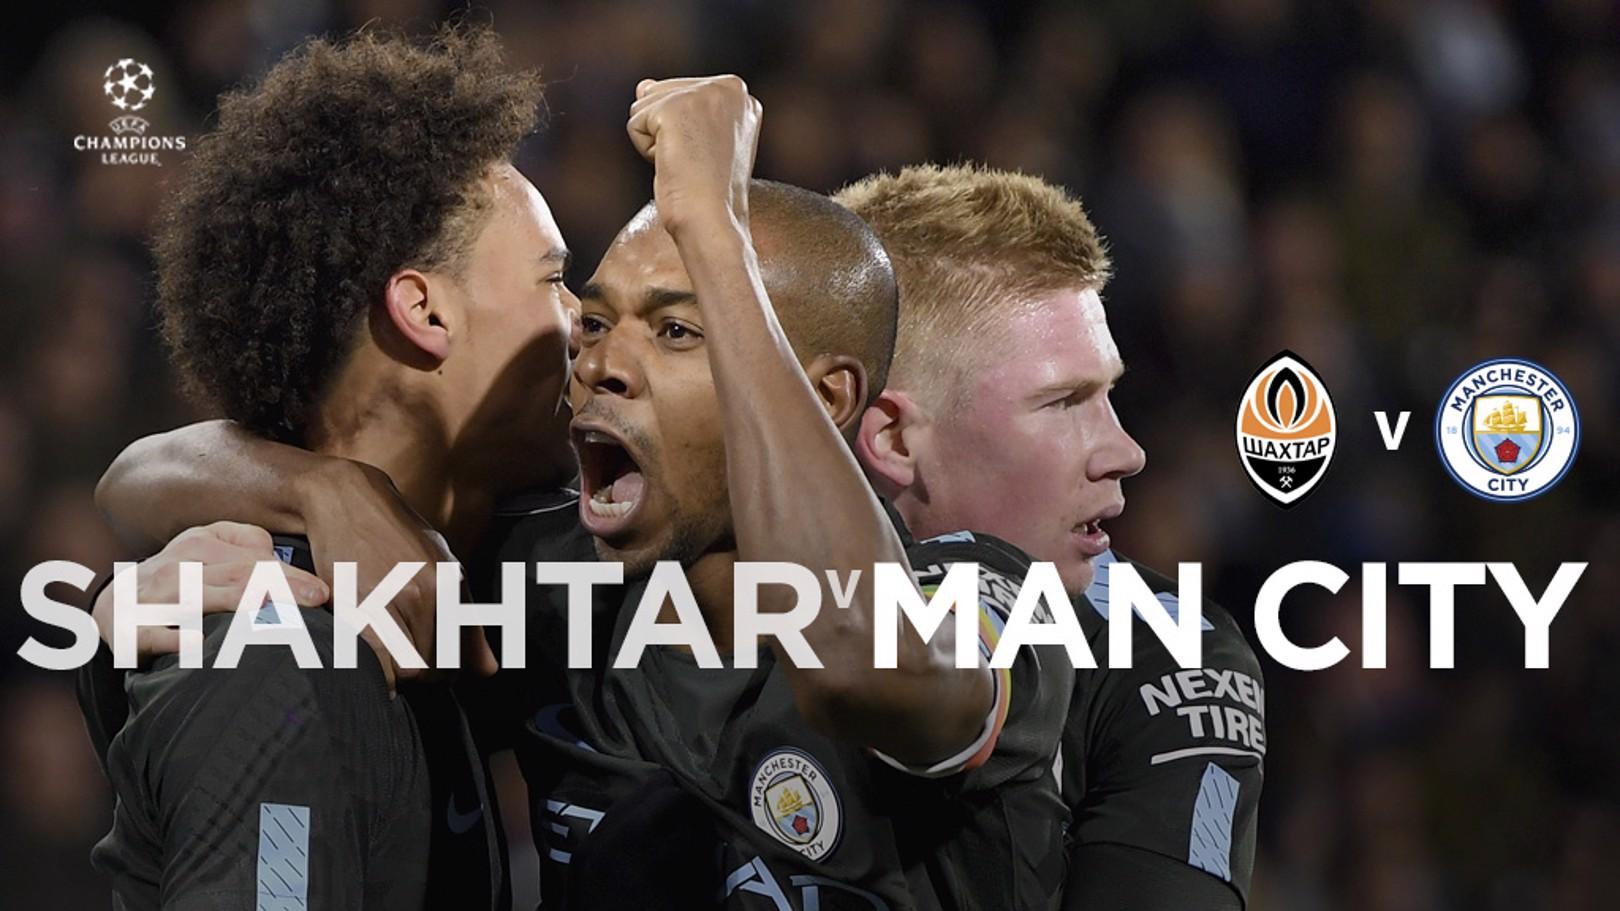 Shakhtar x Man City